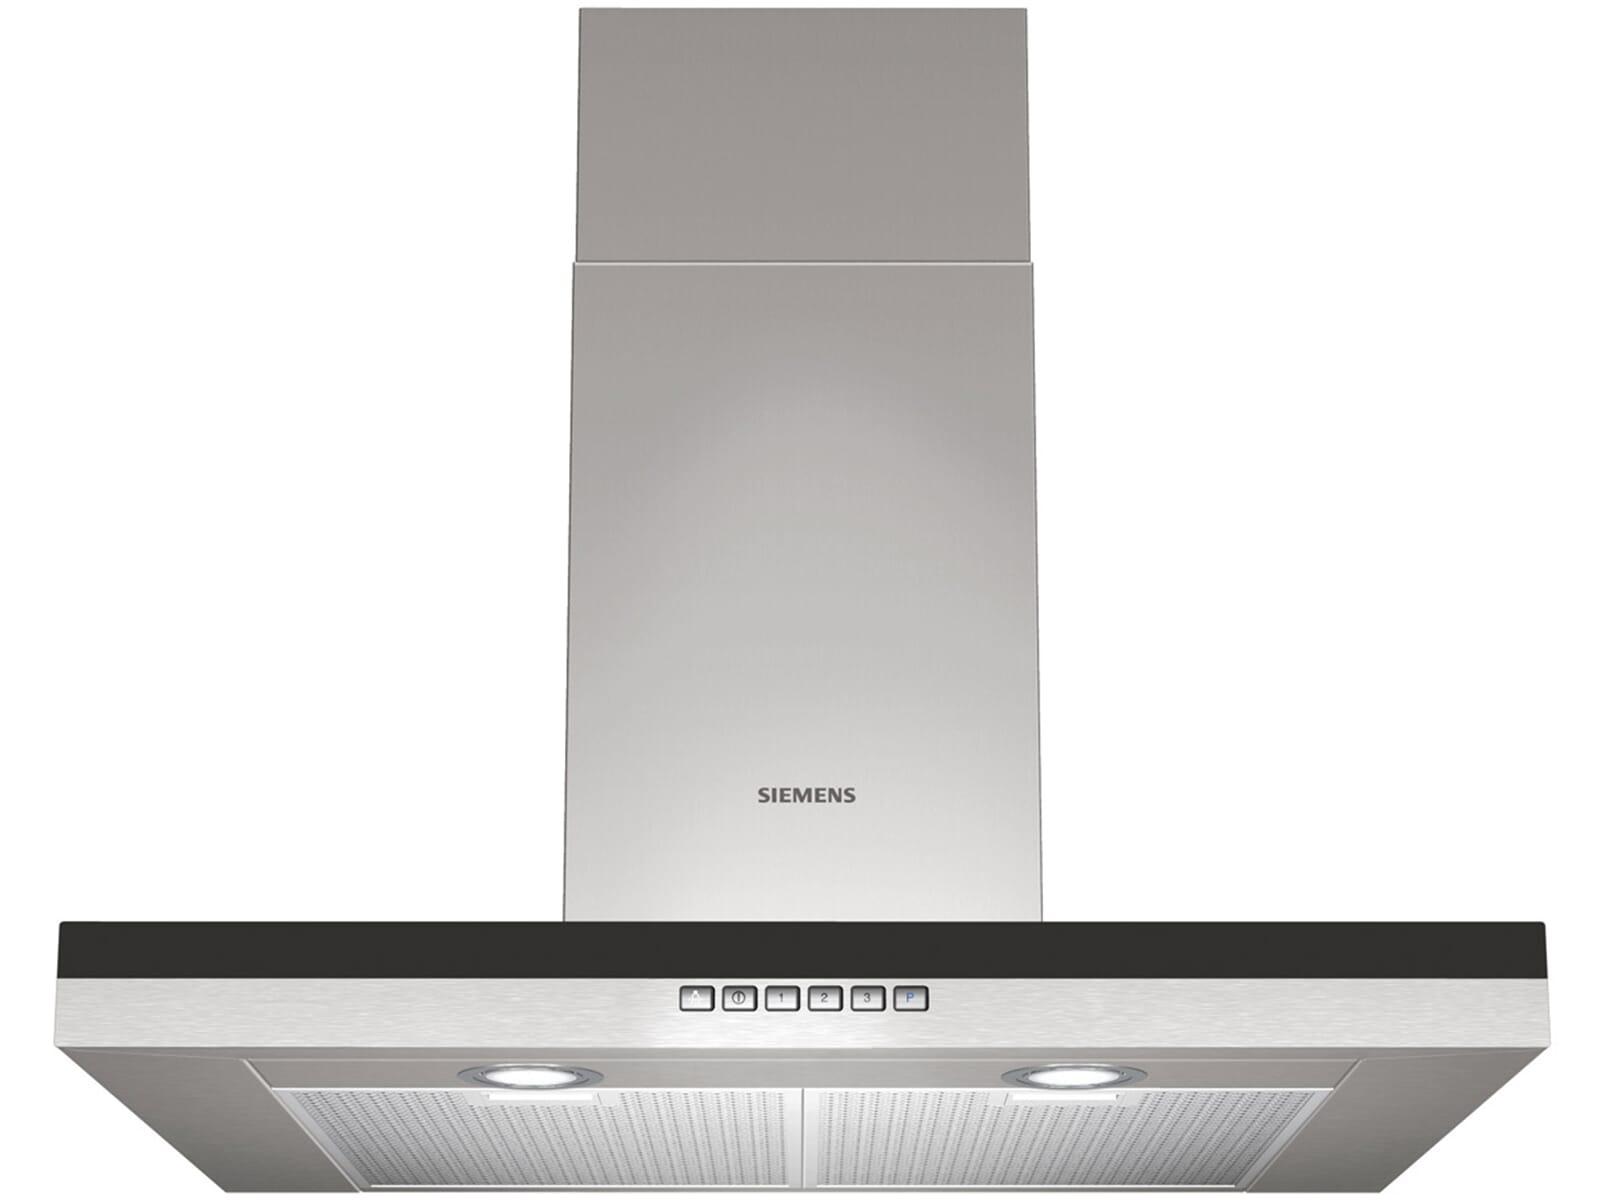 70cm WANDHAUBE Siemens LC76BB530 Dunstabzug EDELSTAHL